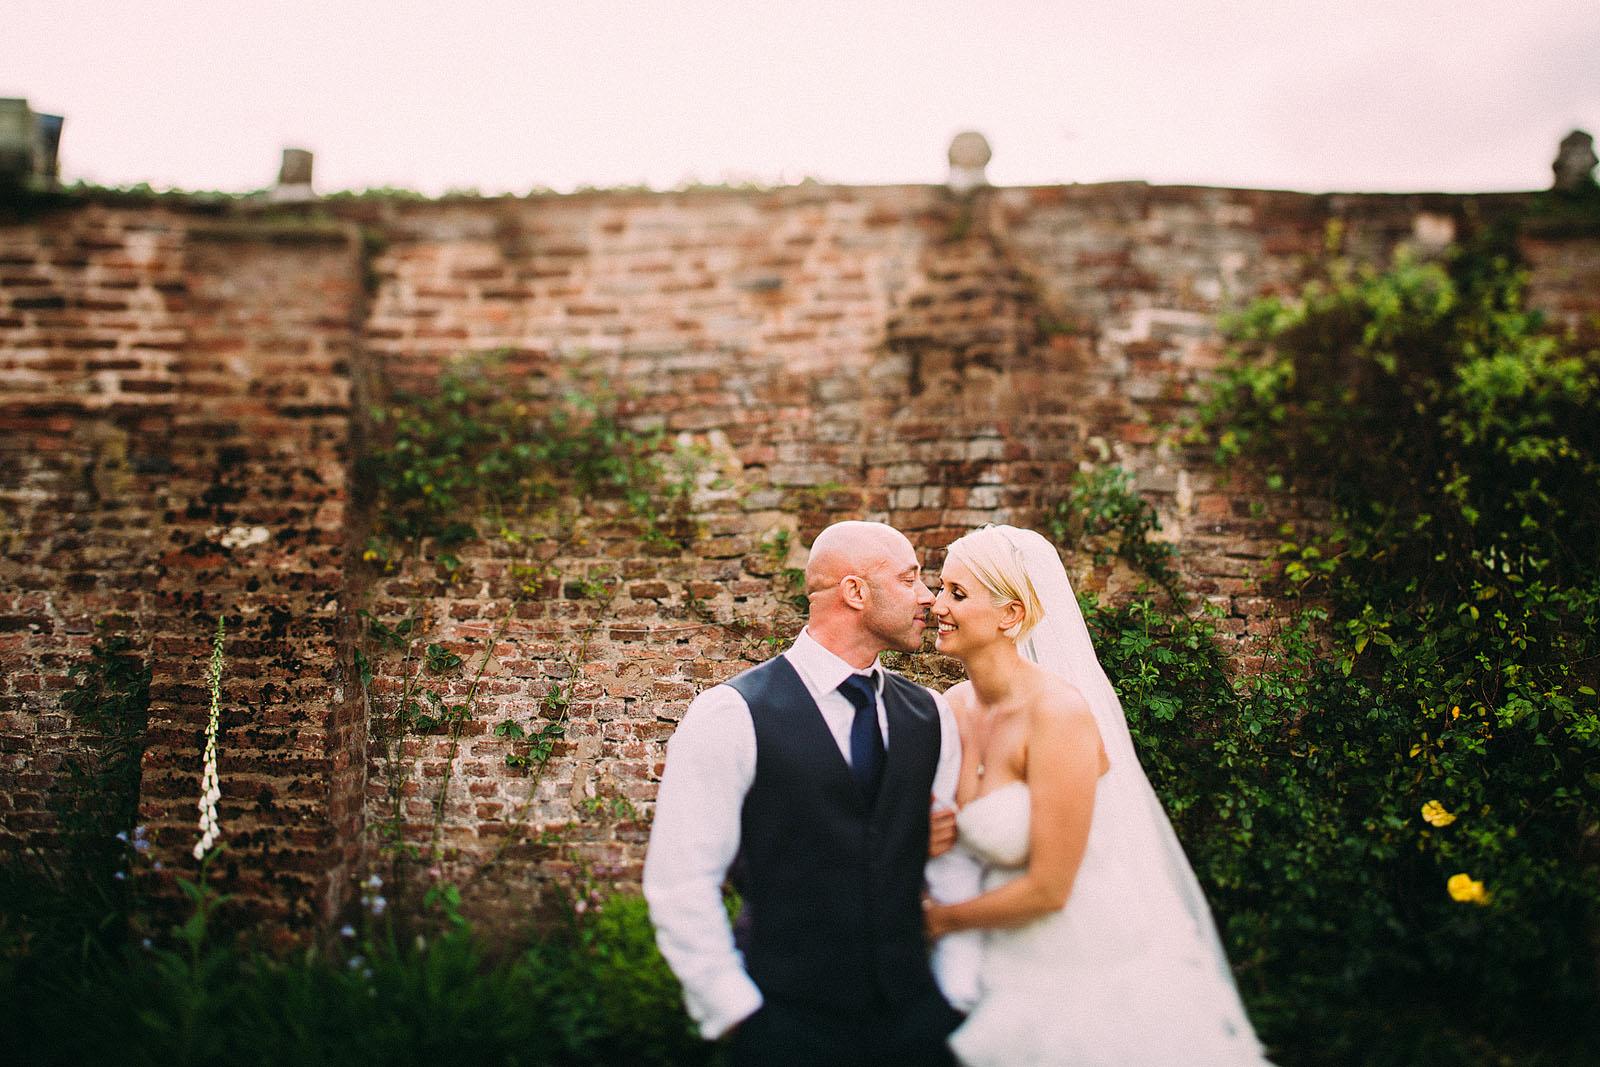 Best-2014-Lawson-Wedding-Photography0005